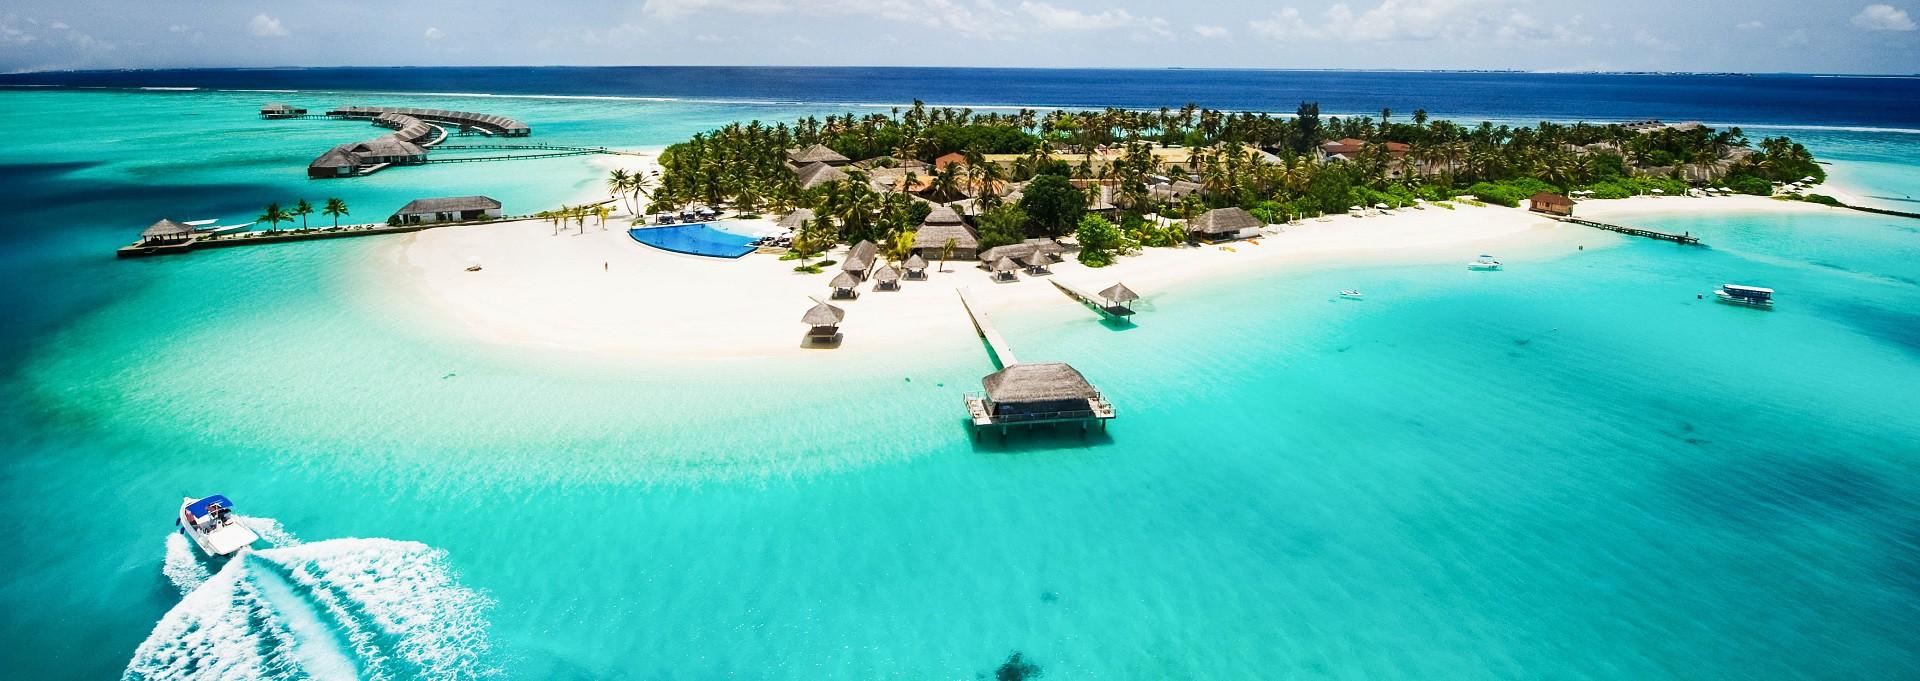 Beste Hotels Malediven  Sterne